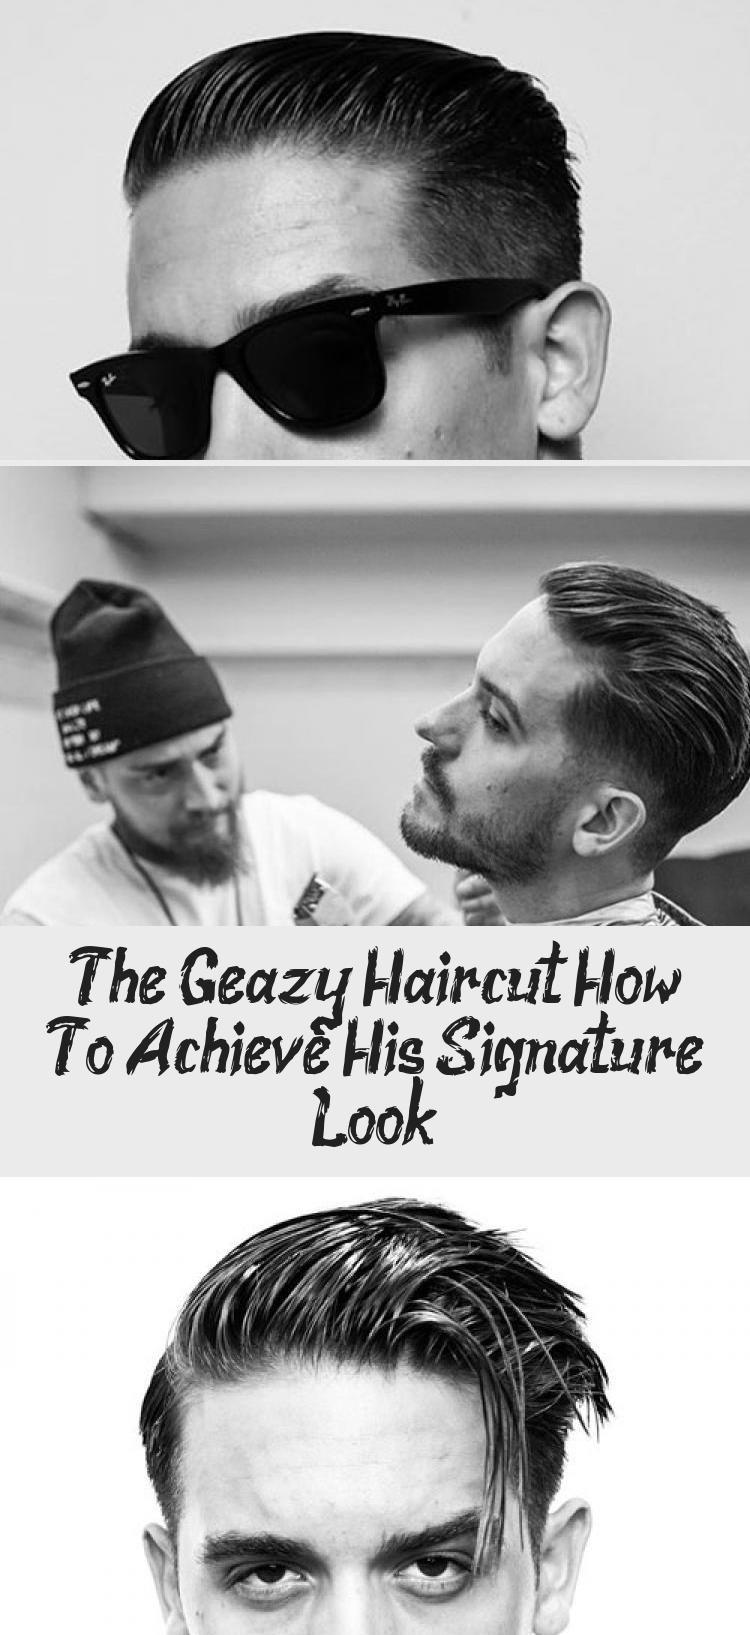 G Eazy In Barber Shop Haircut Menshairstyles Menshaircuts Menshair Mensfas In 2020 Wedding Hairstyles Videos Classic Wedding Hair Wedding Hairstyles For Long Hair